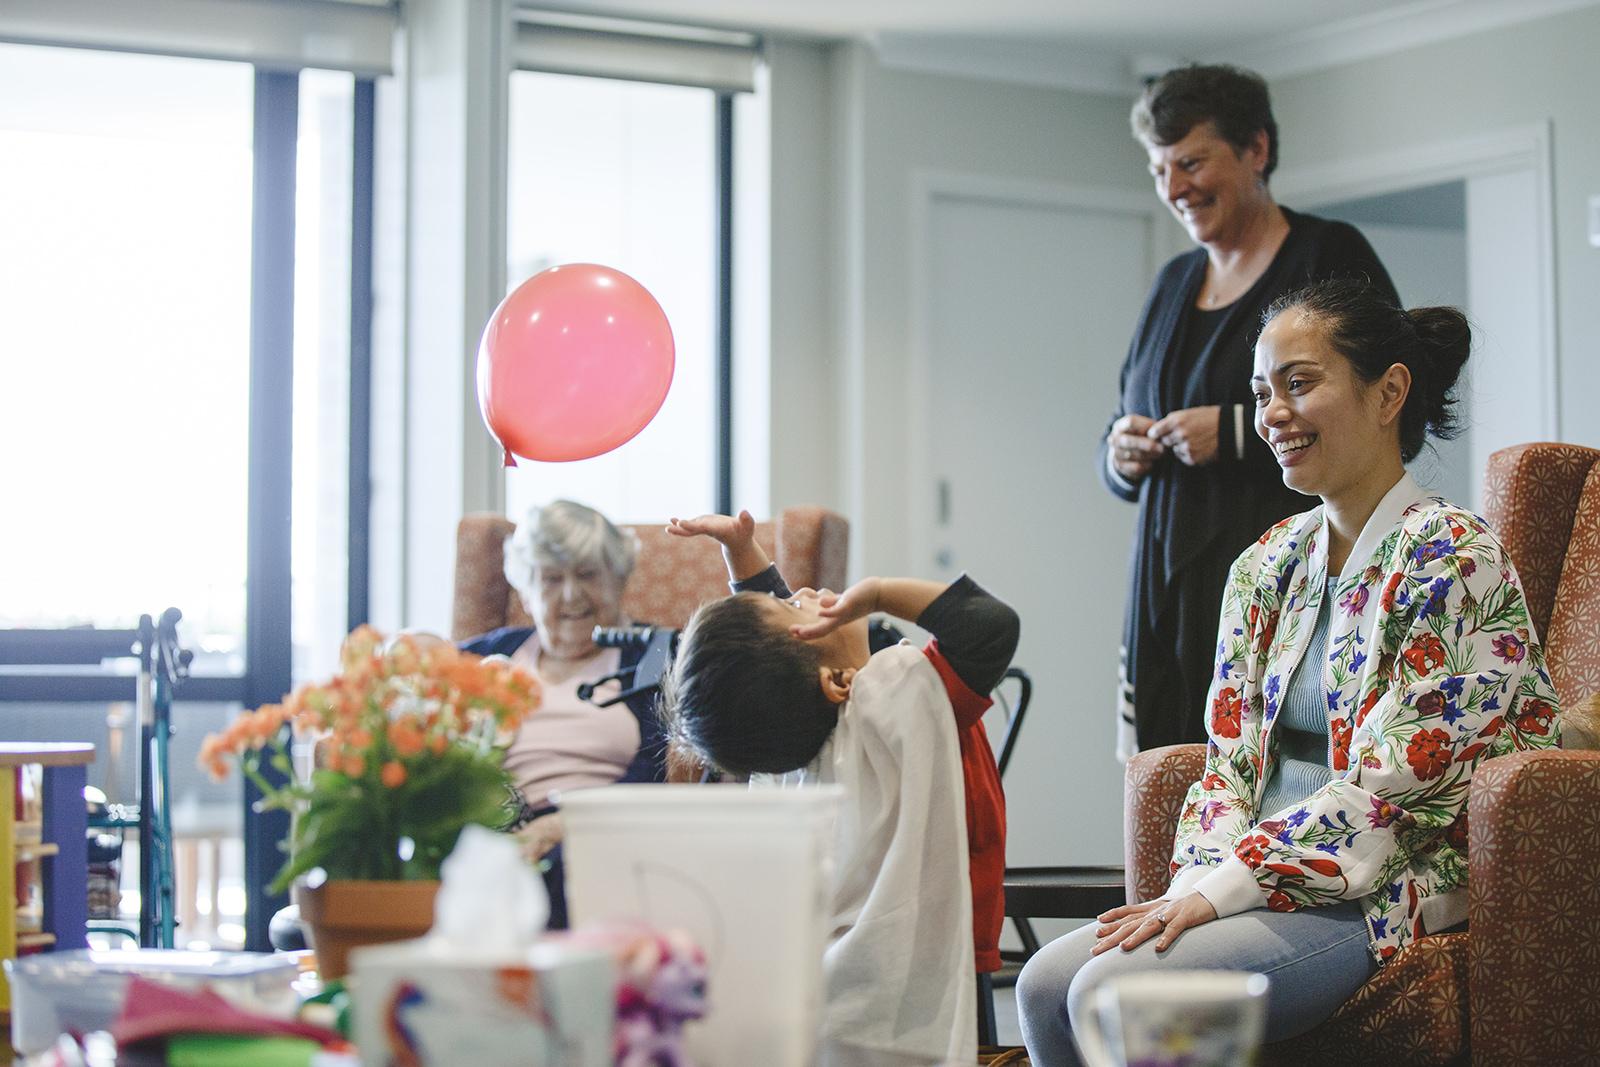 Act-of-Kindness-Elderly-Rest-Home-Visits-62.jpg